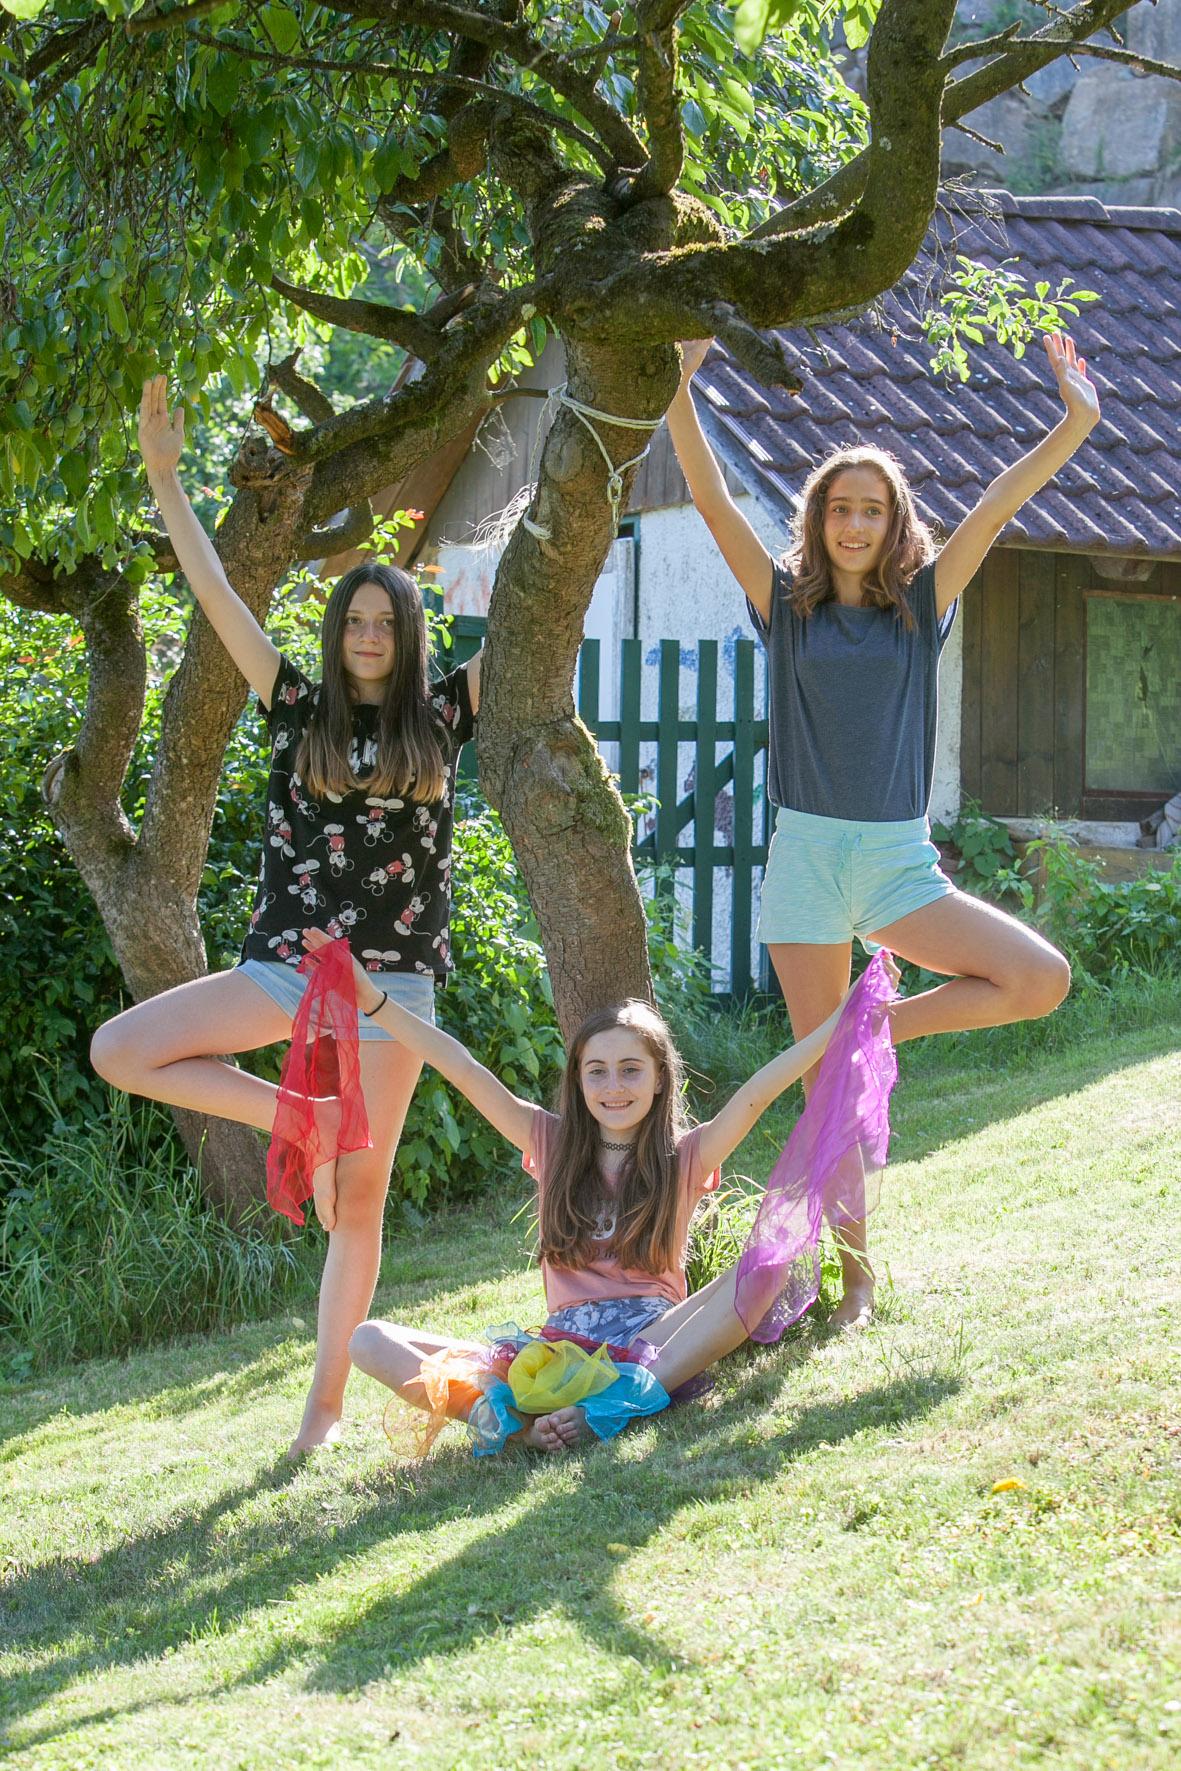 Foto Teenageryoga: 3 Mädchen in Yoga-Position Baum